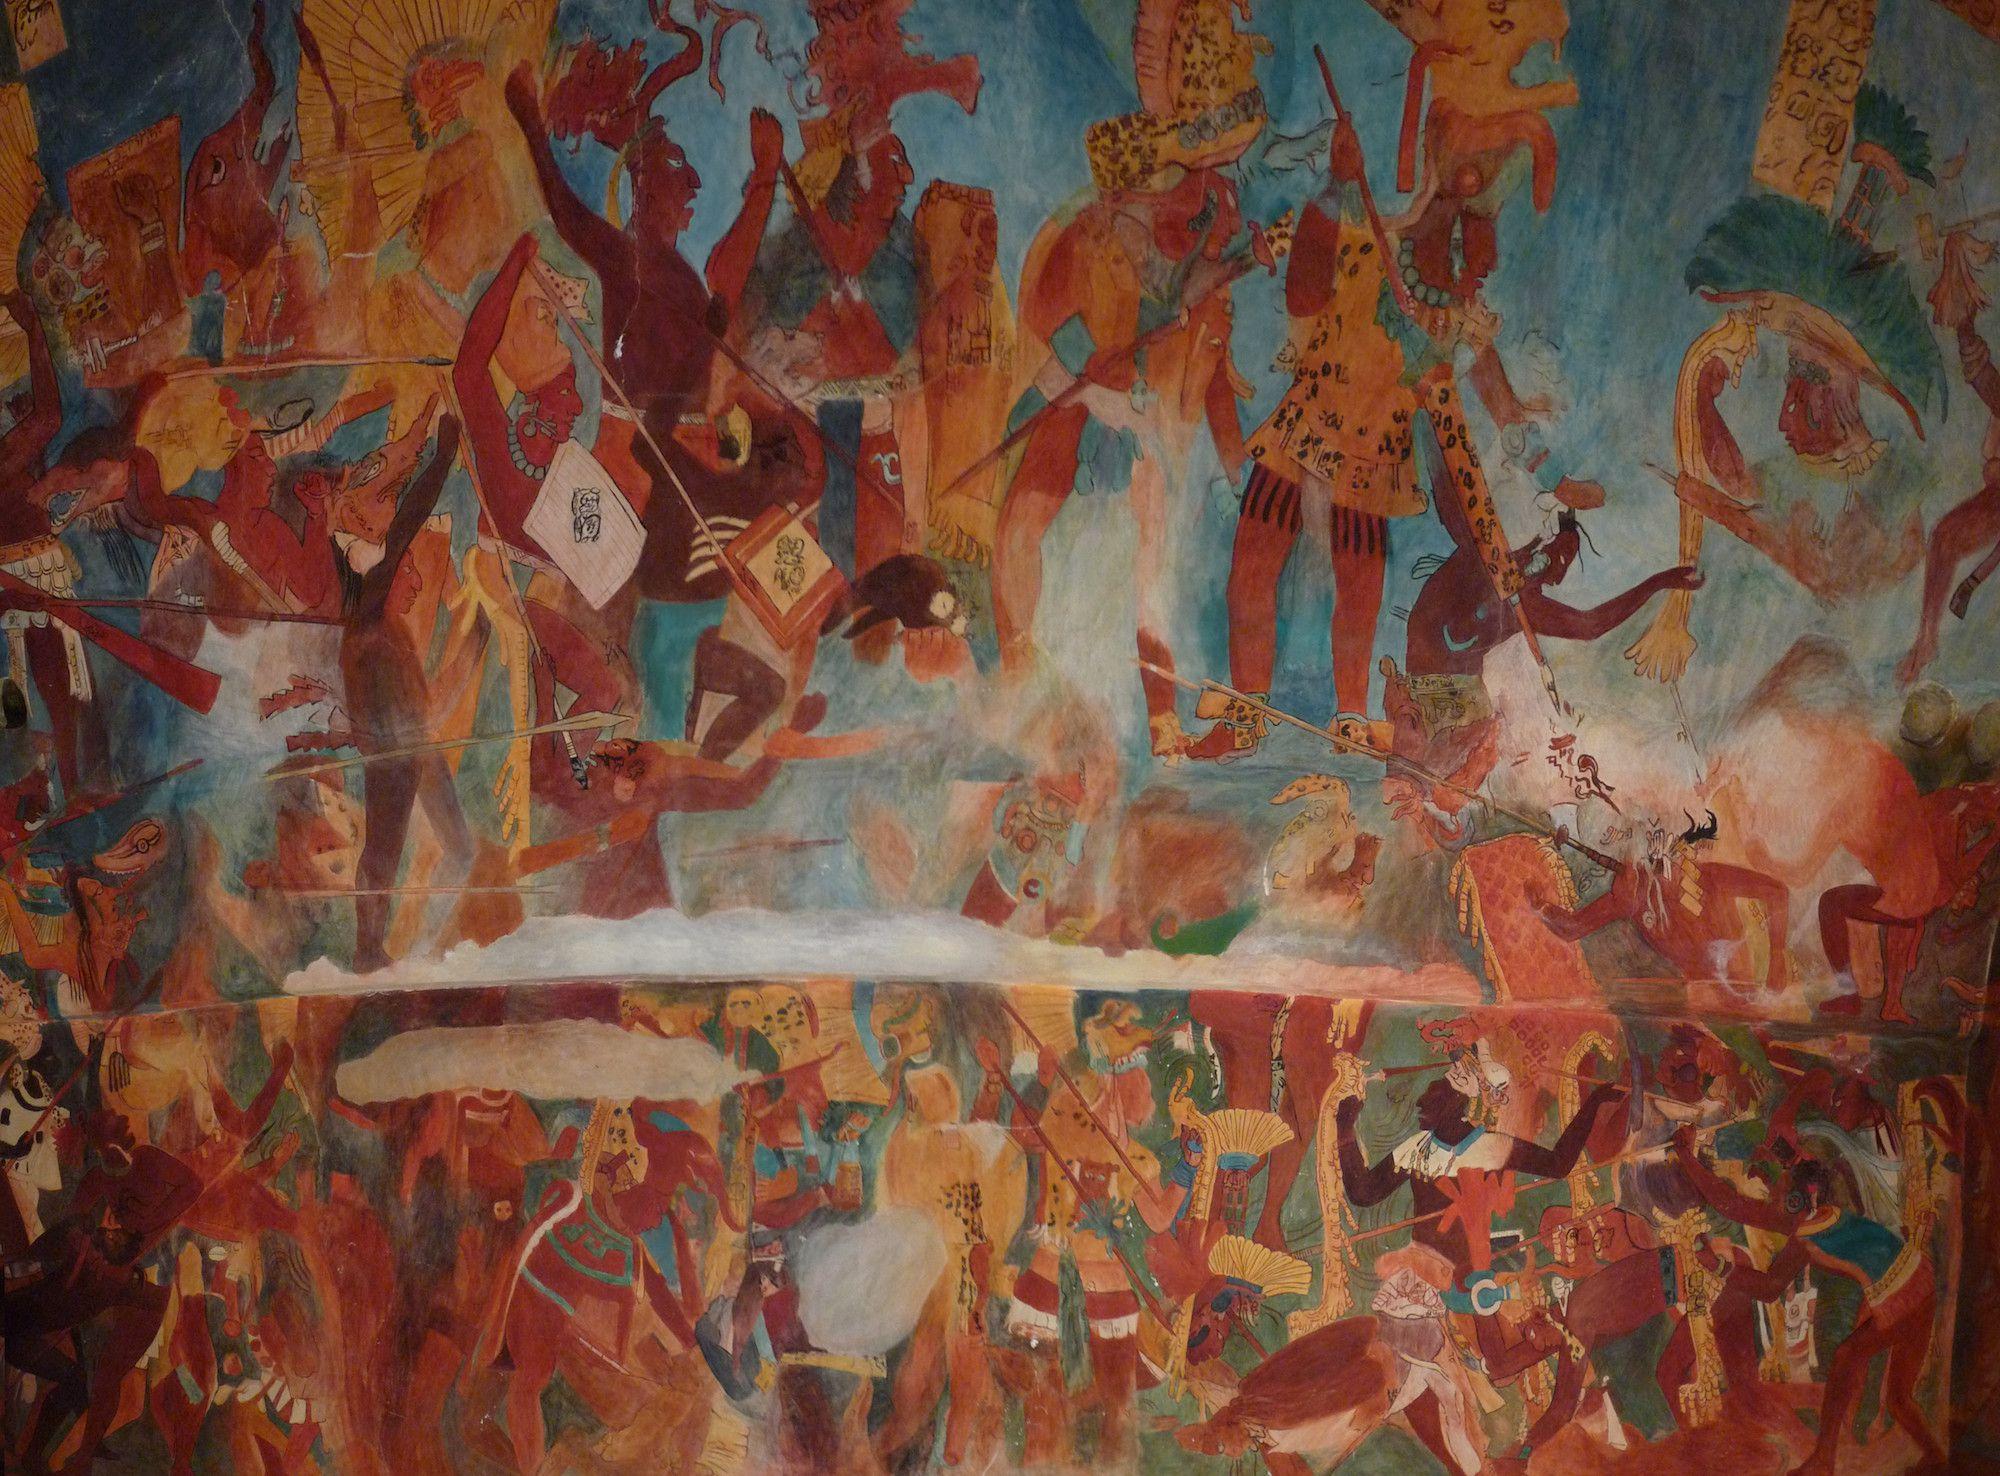 Ancient mayan warriors and warfare for Bonampak mural painting